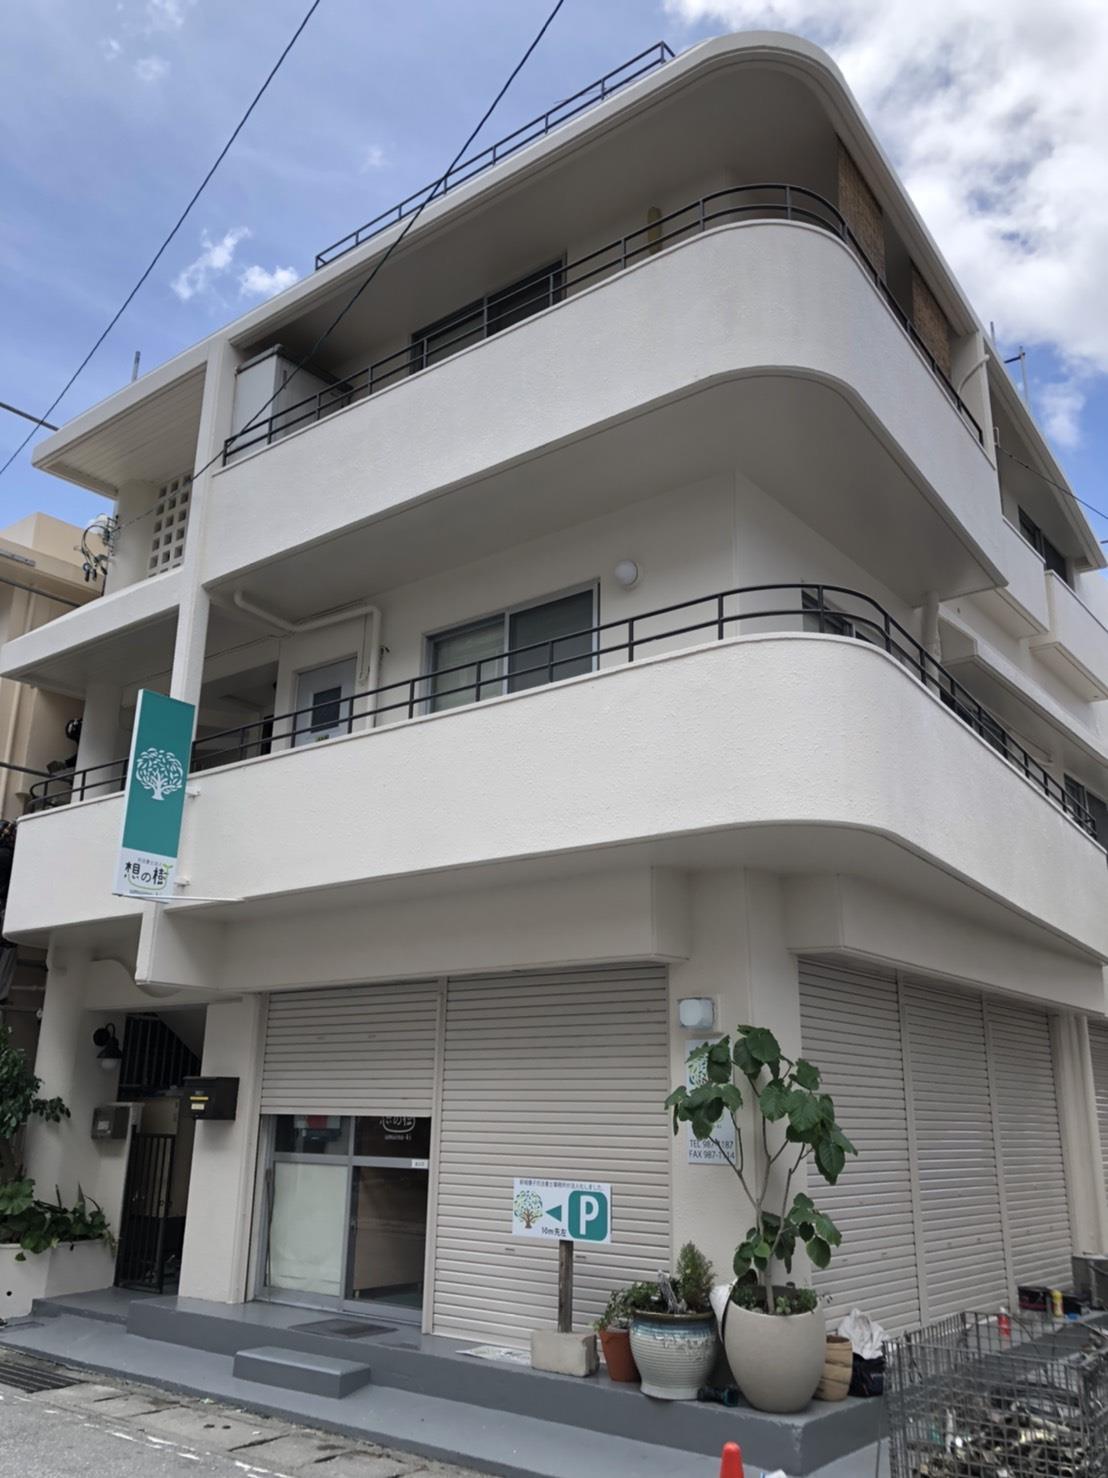 M邸防水塗装工事(リフォーム施工事例)を公開しました。 | 沖縄や那覇でリフォームするなら【株式会社 あうん工房】